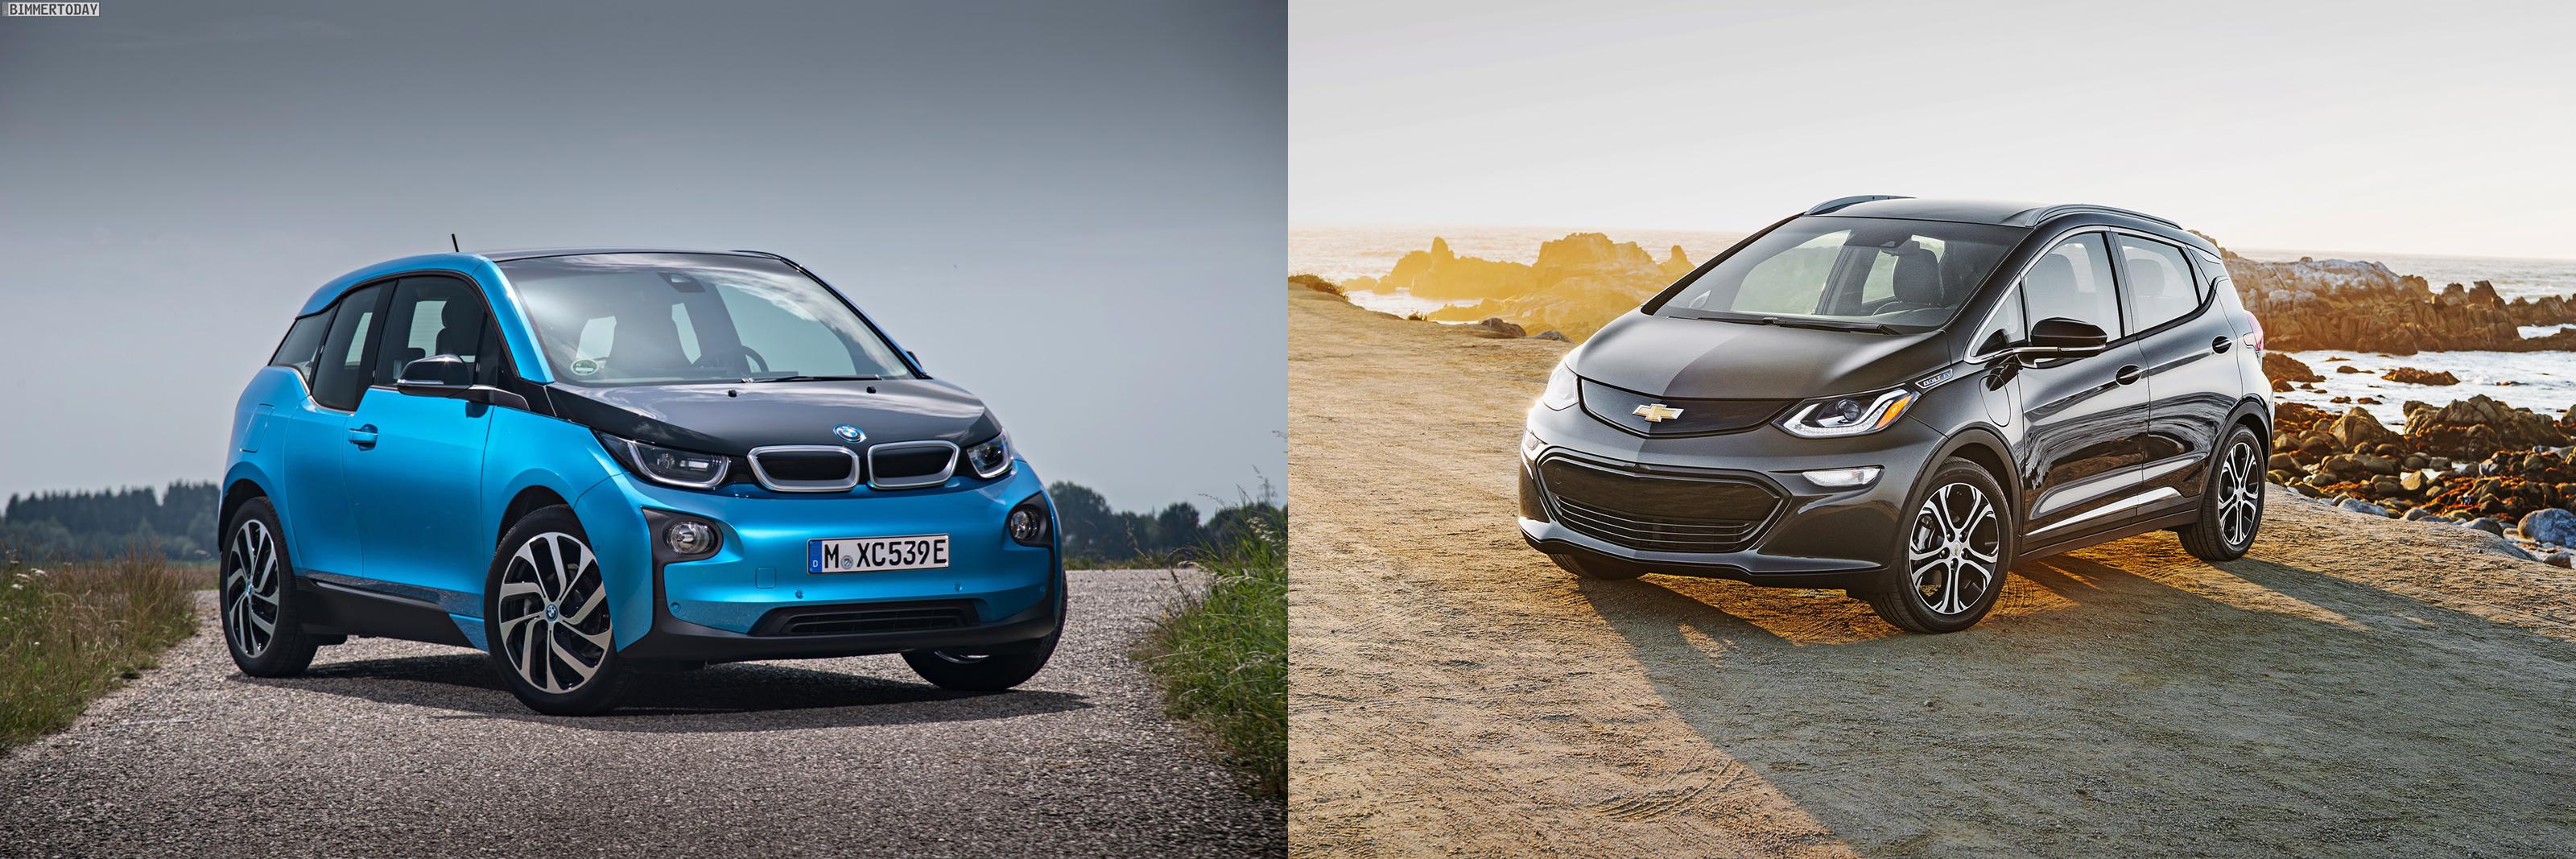 BMW i3 Chevy Bolt comparison